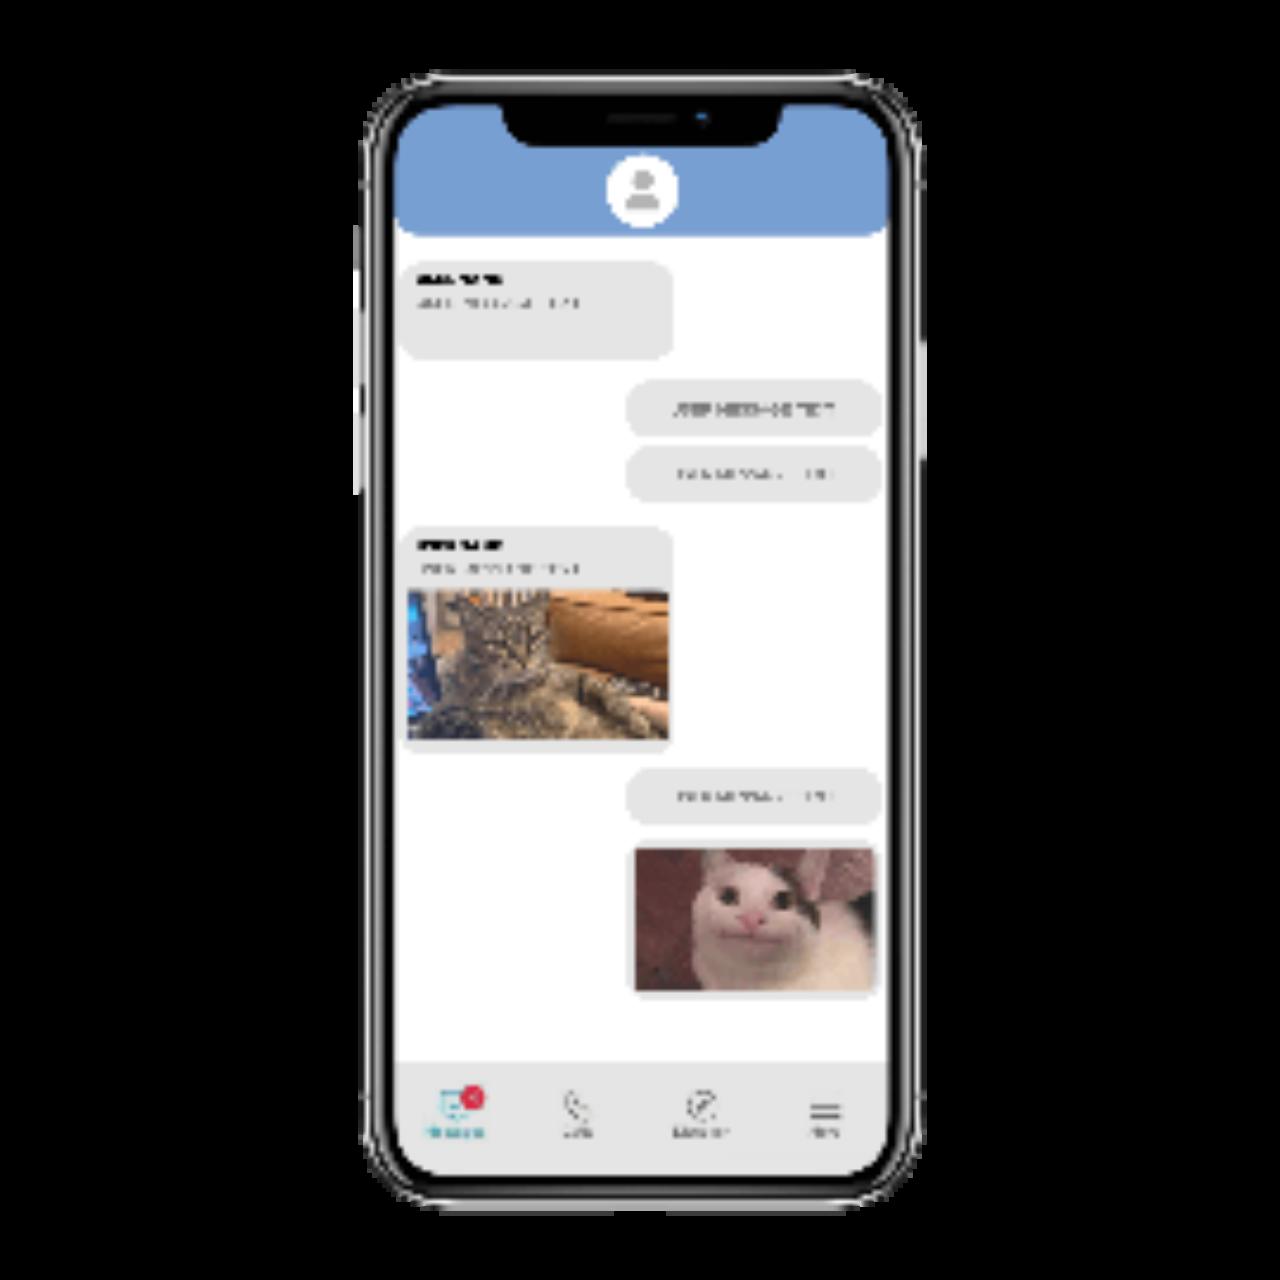 Messaging app - messages